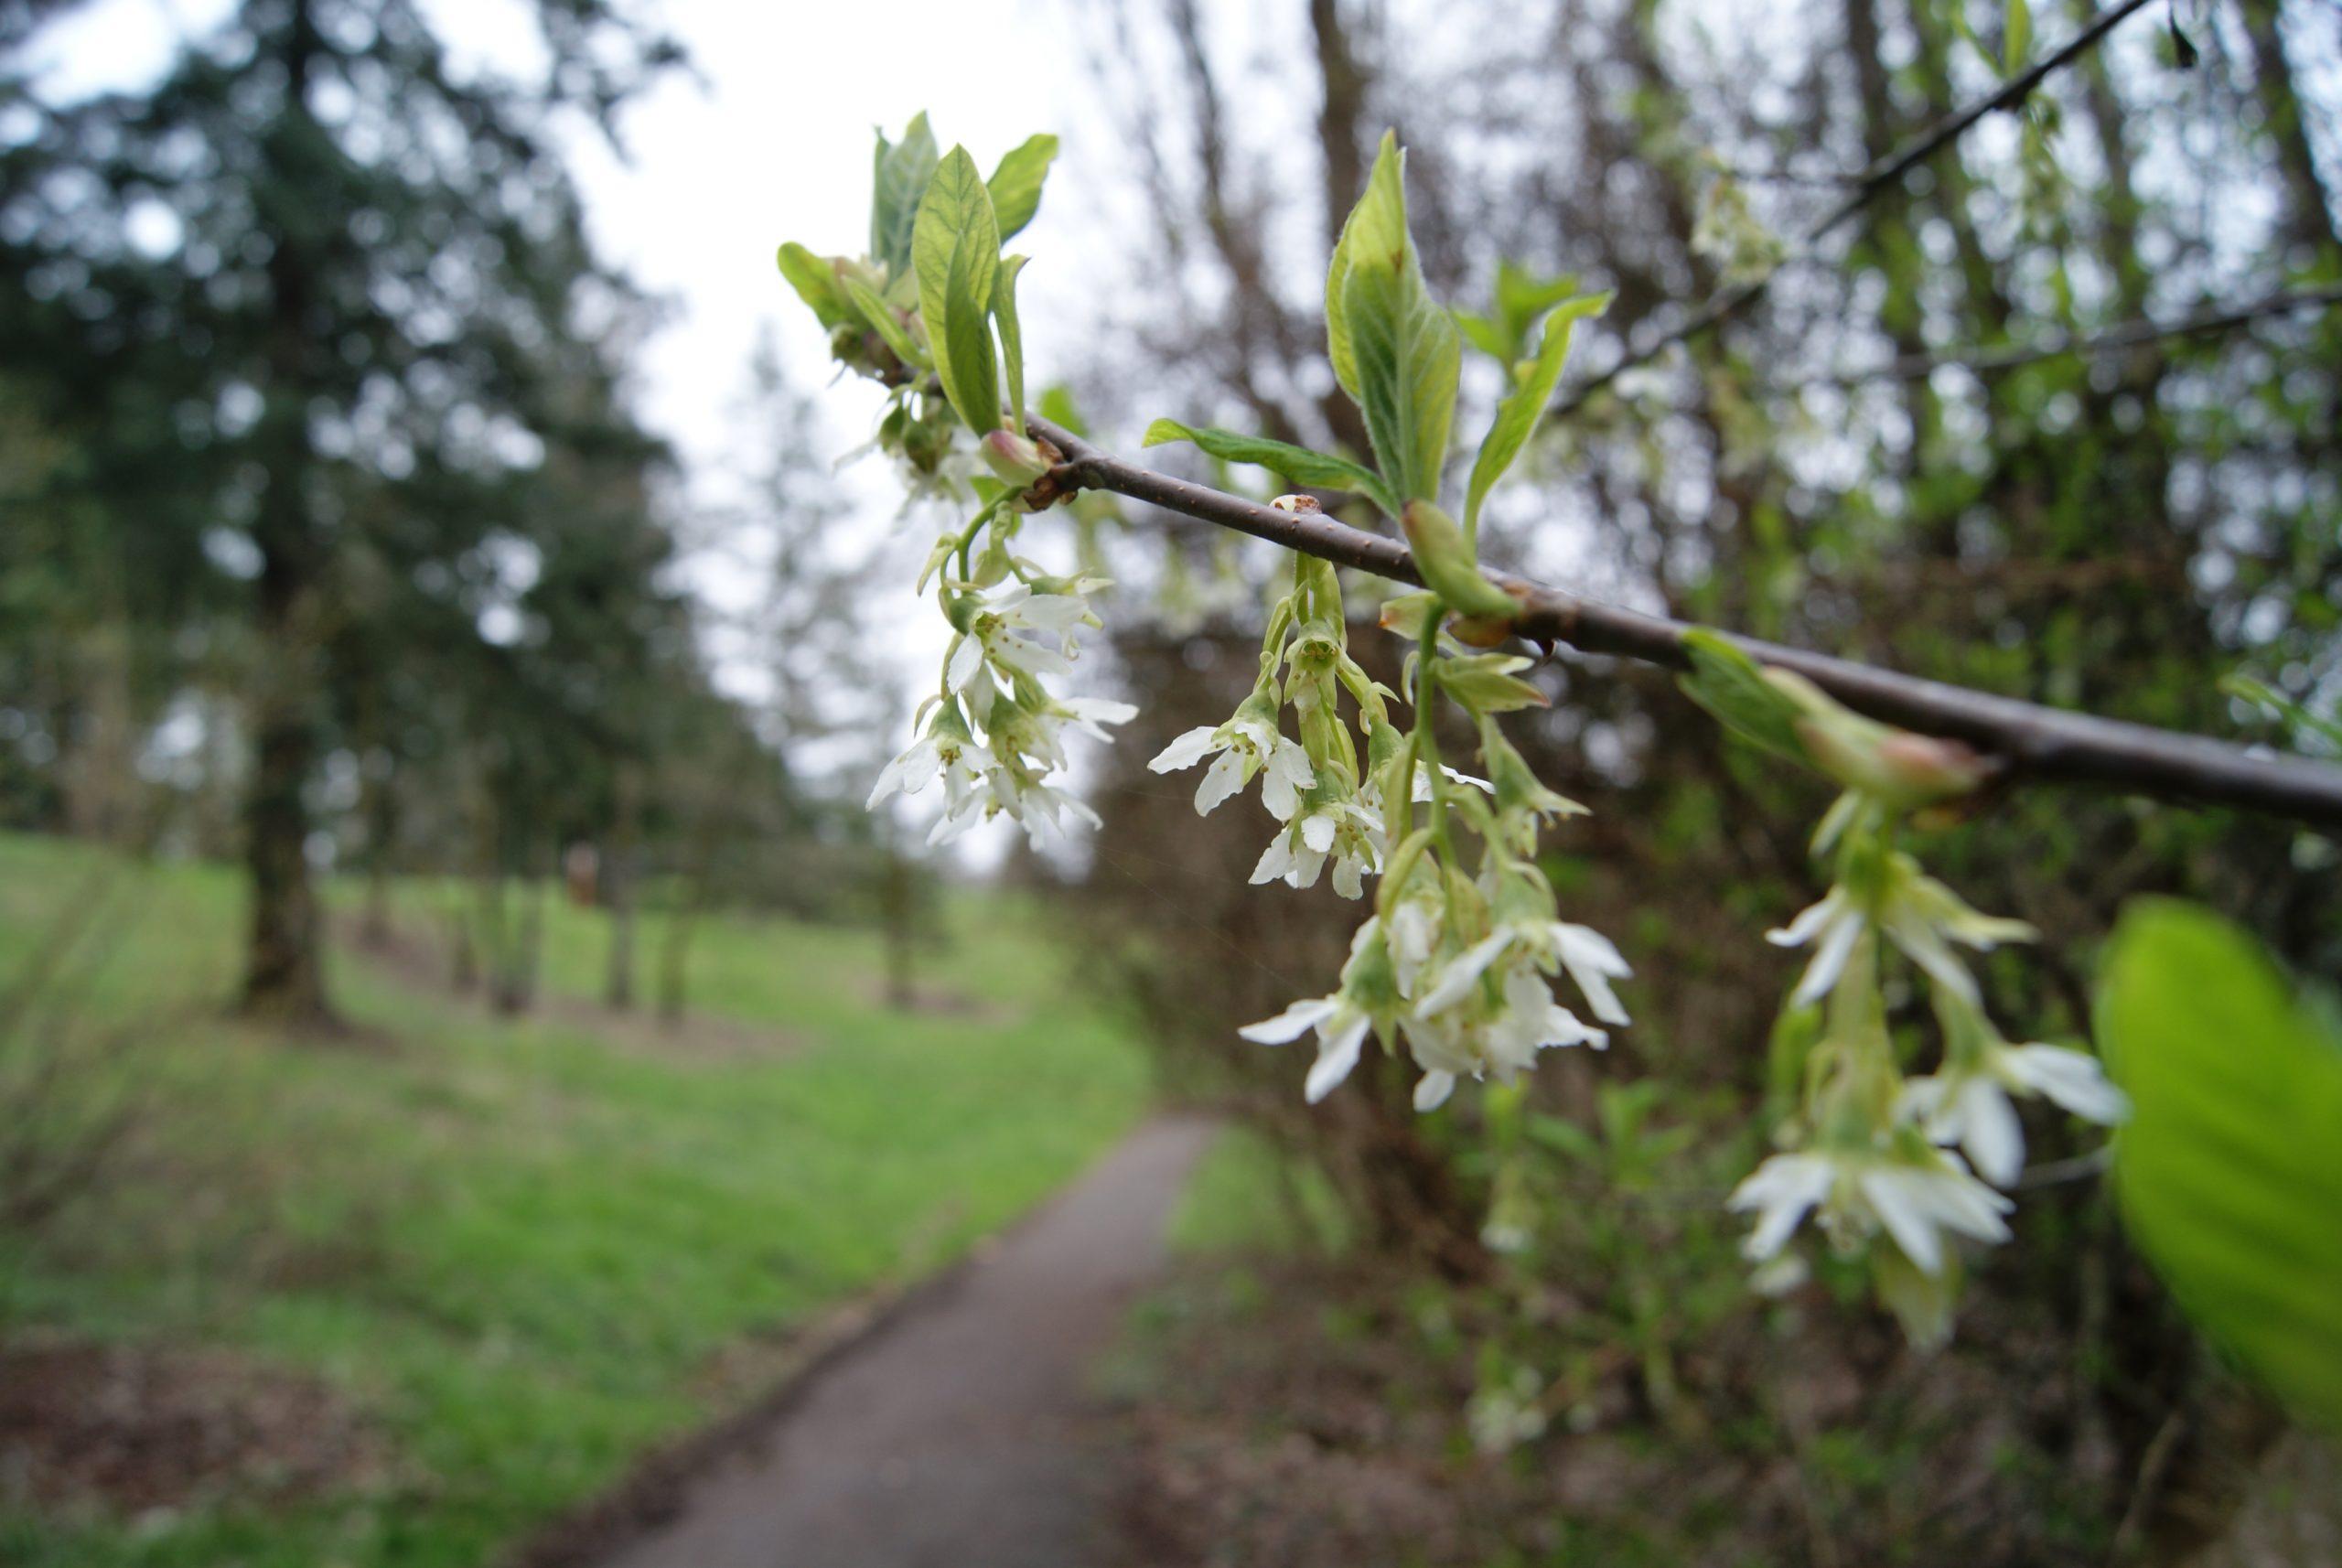 Guided Hike of Hoyt Arboretum